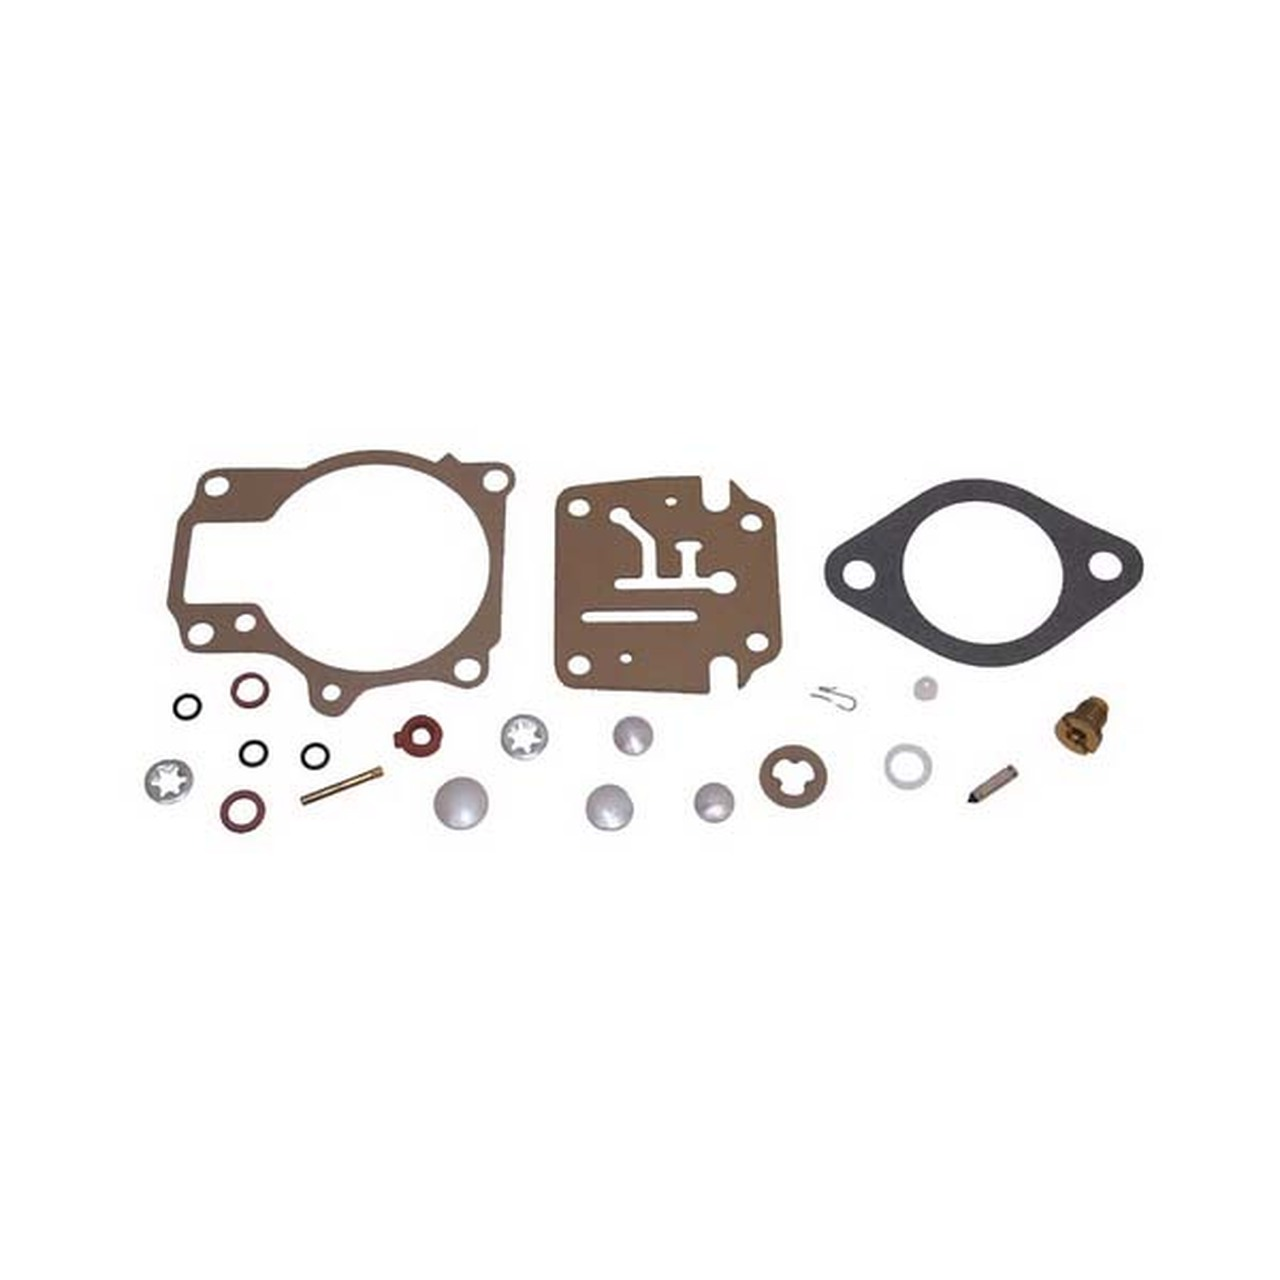 Sierra 18-7042 Carburetor Kit Replaces 0396701